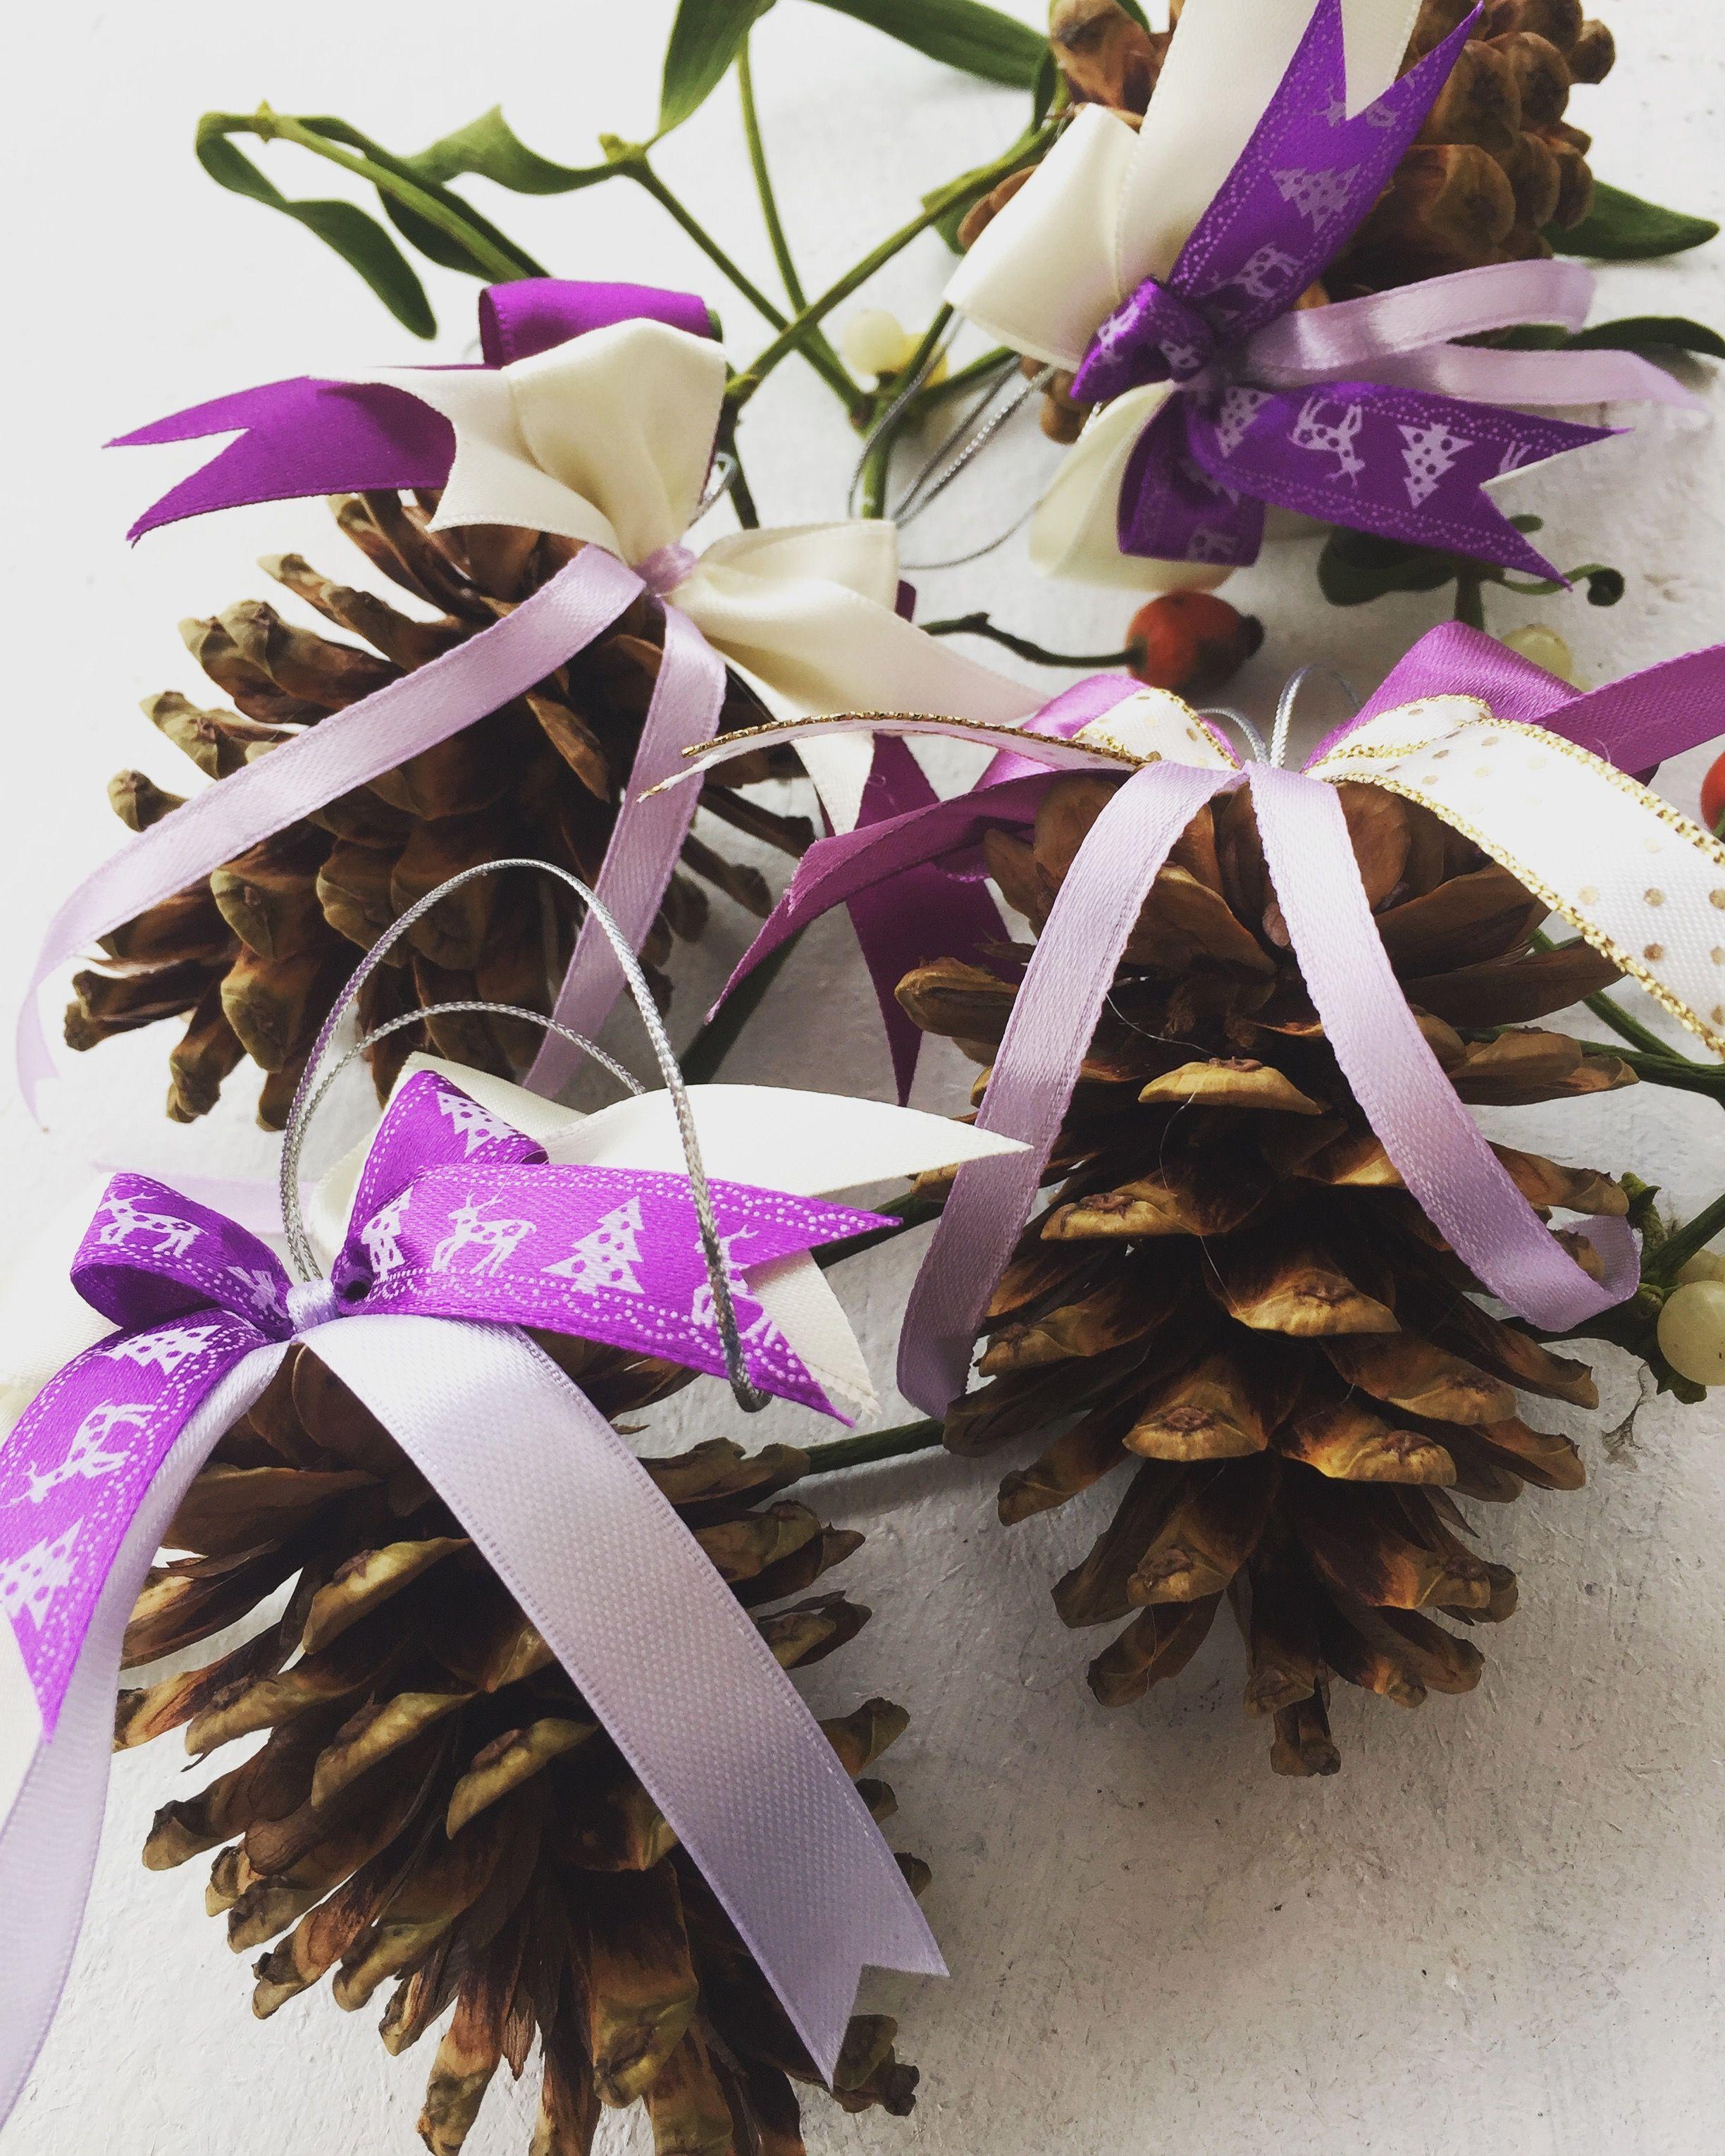 Diy Nature Homemade Christmas Tree Ornaments  Term Szetes Anyagokb